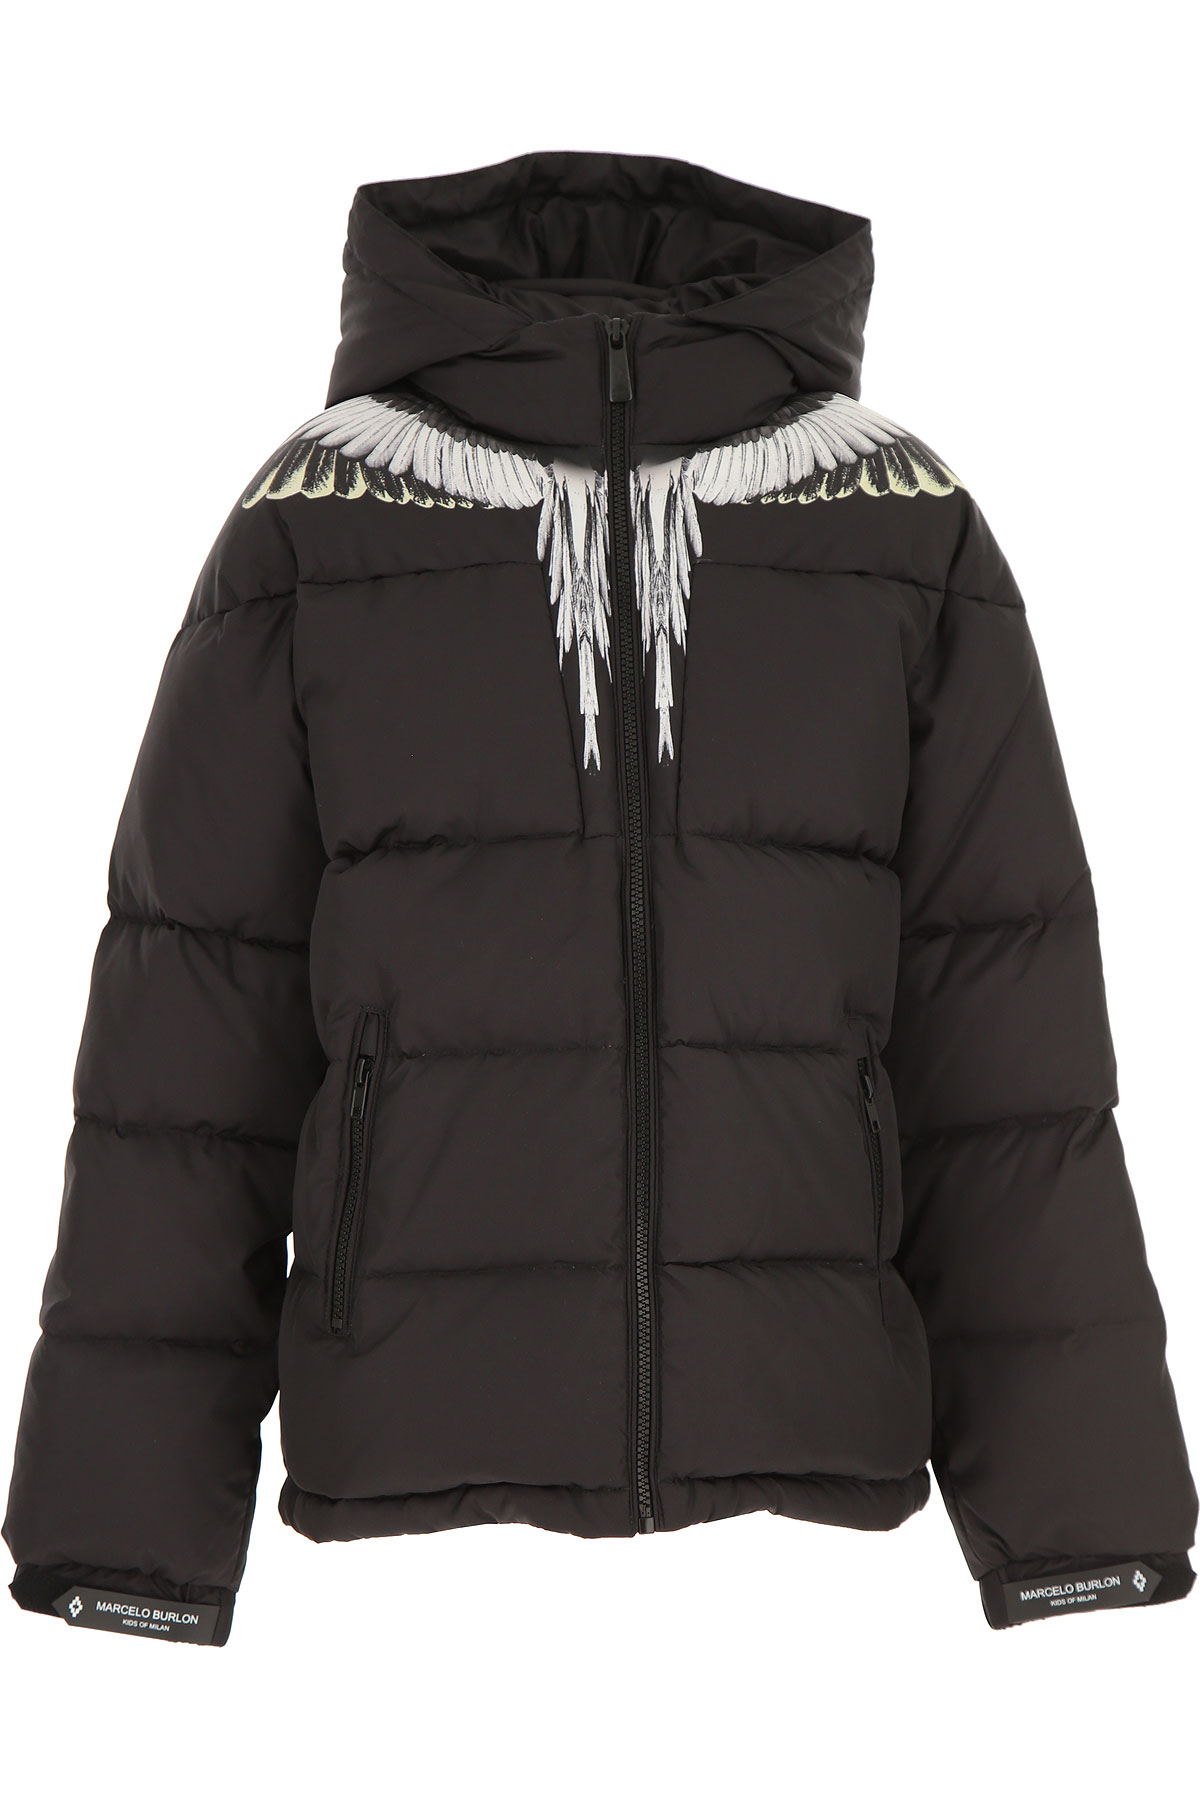 Marcelo Burlon Boys Down Jacket for Kids, Puffer Ski Jacket On Sale, Black, polyester, 2019, 12Y 14Y